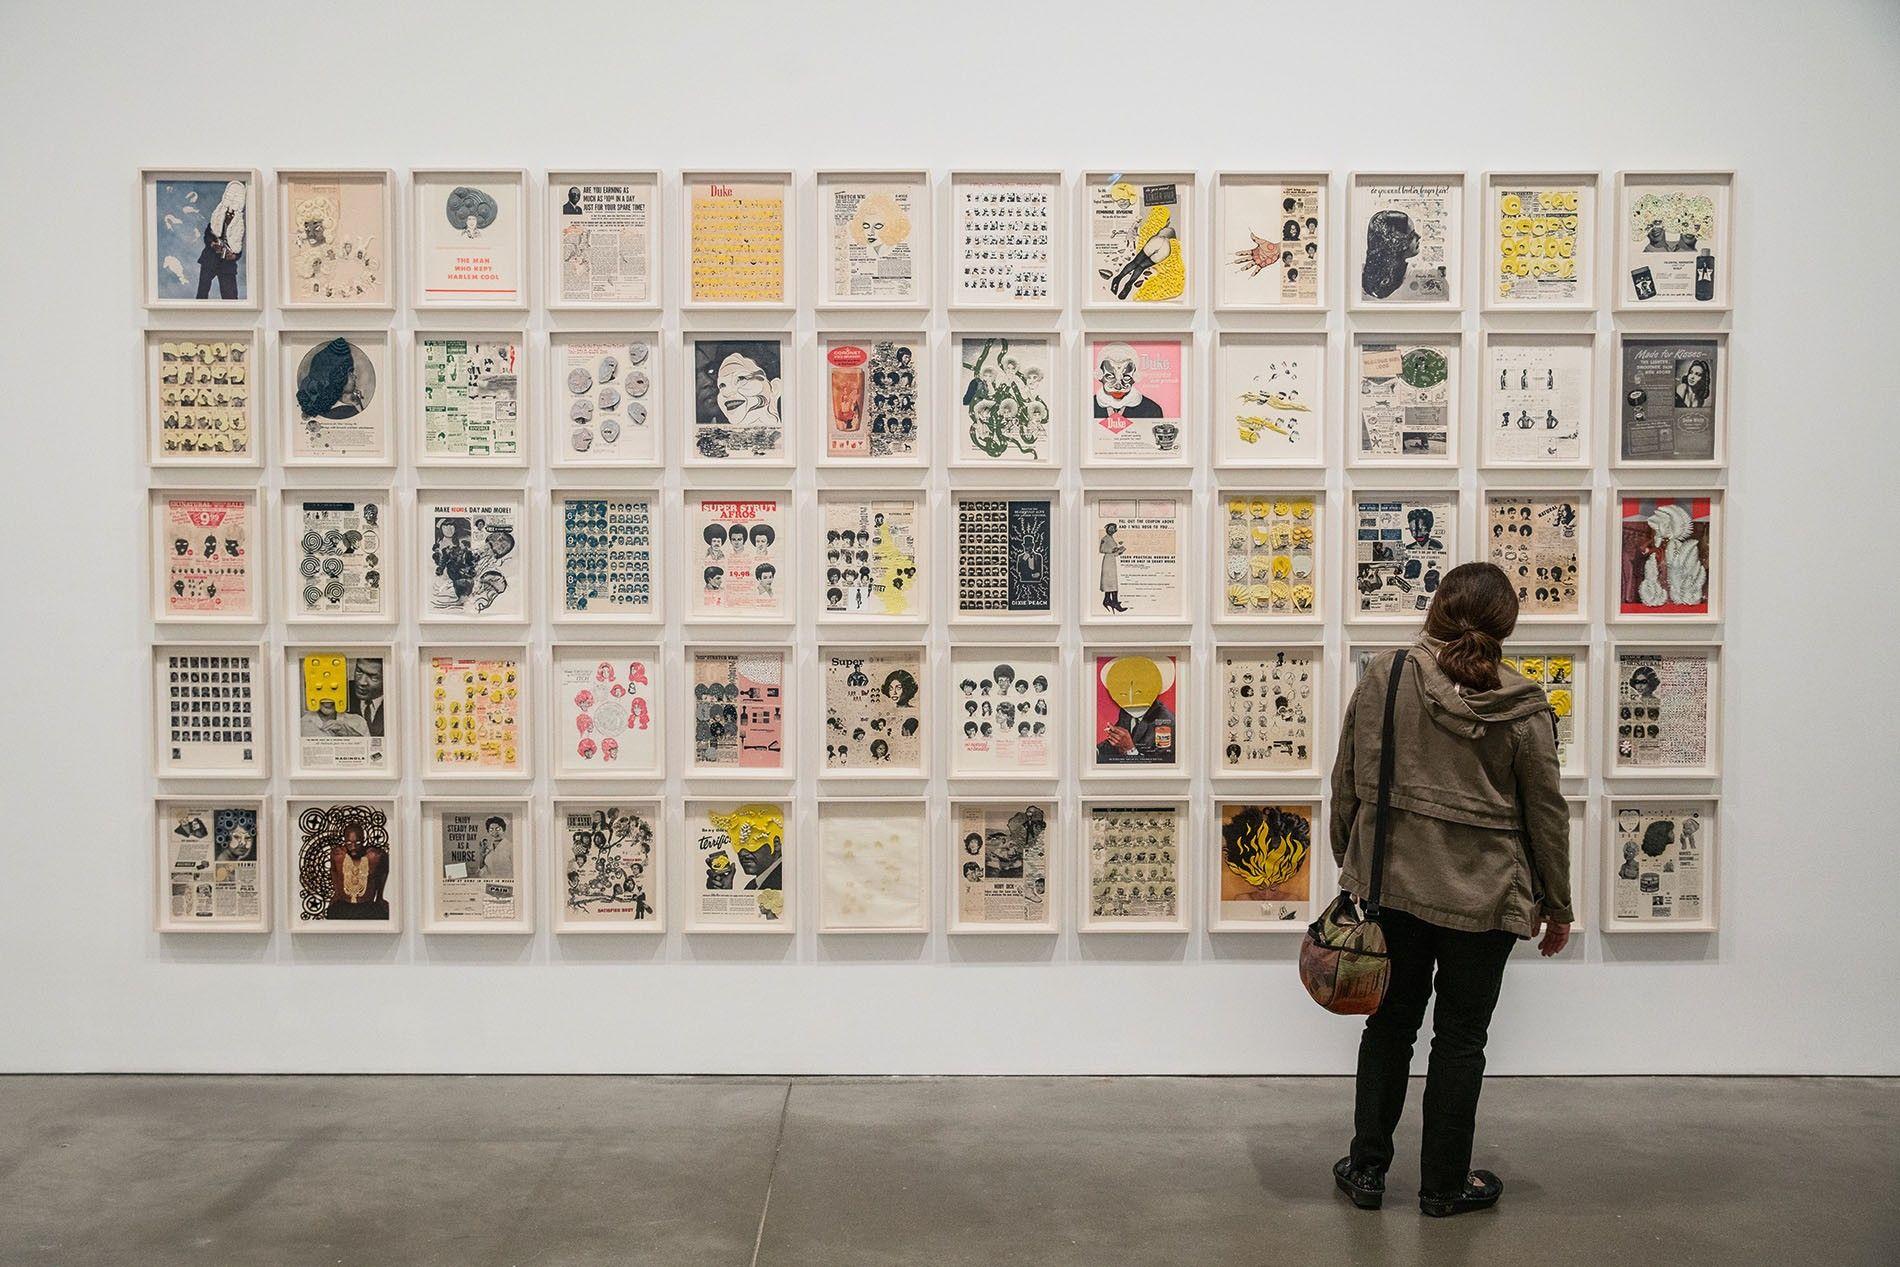 Boston: top 8 art hotspots in the city